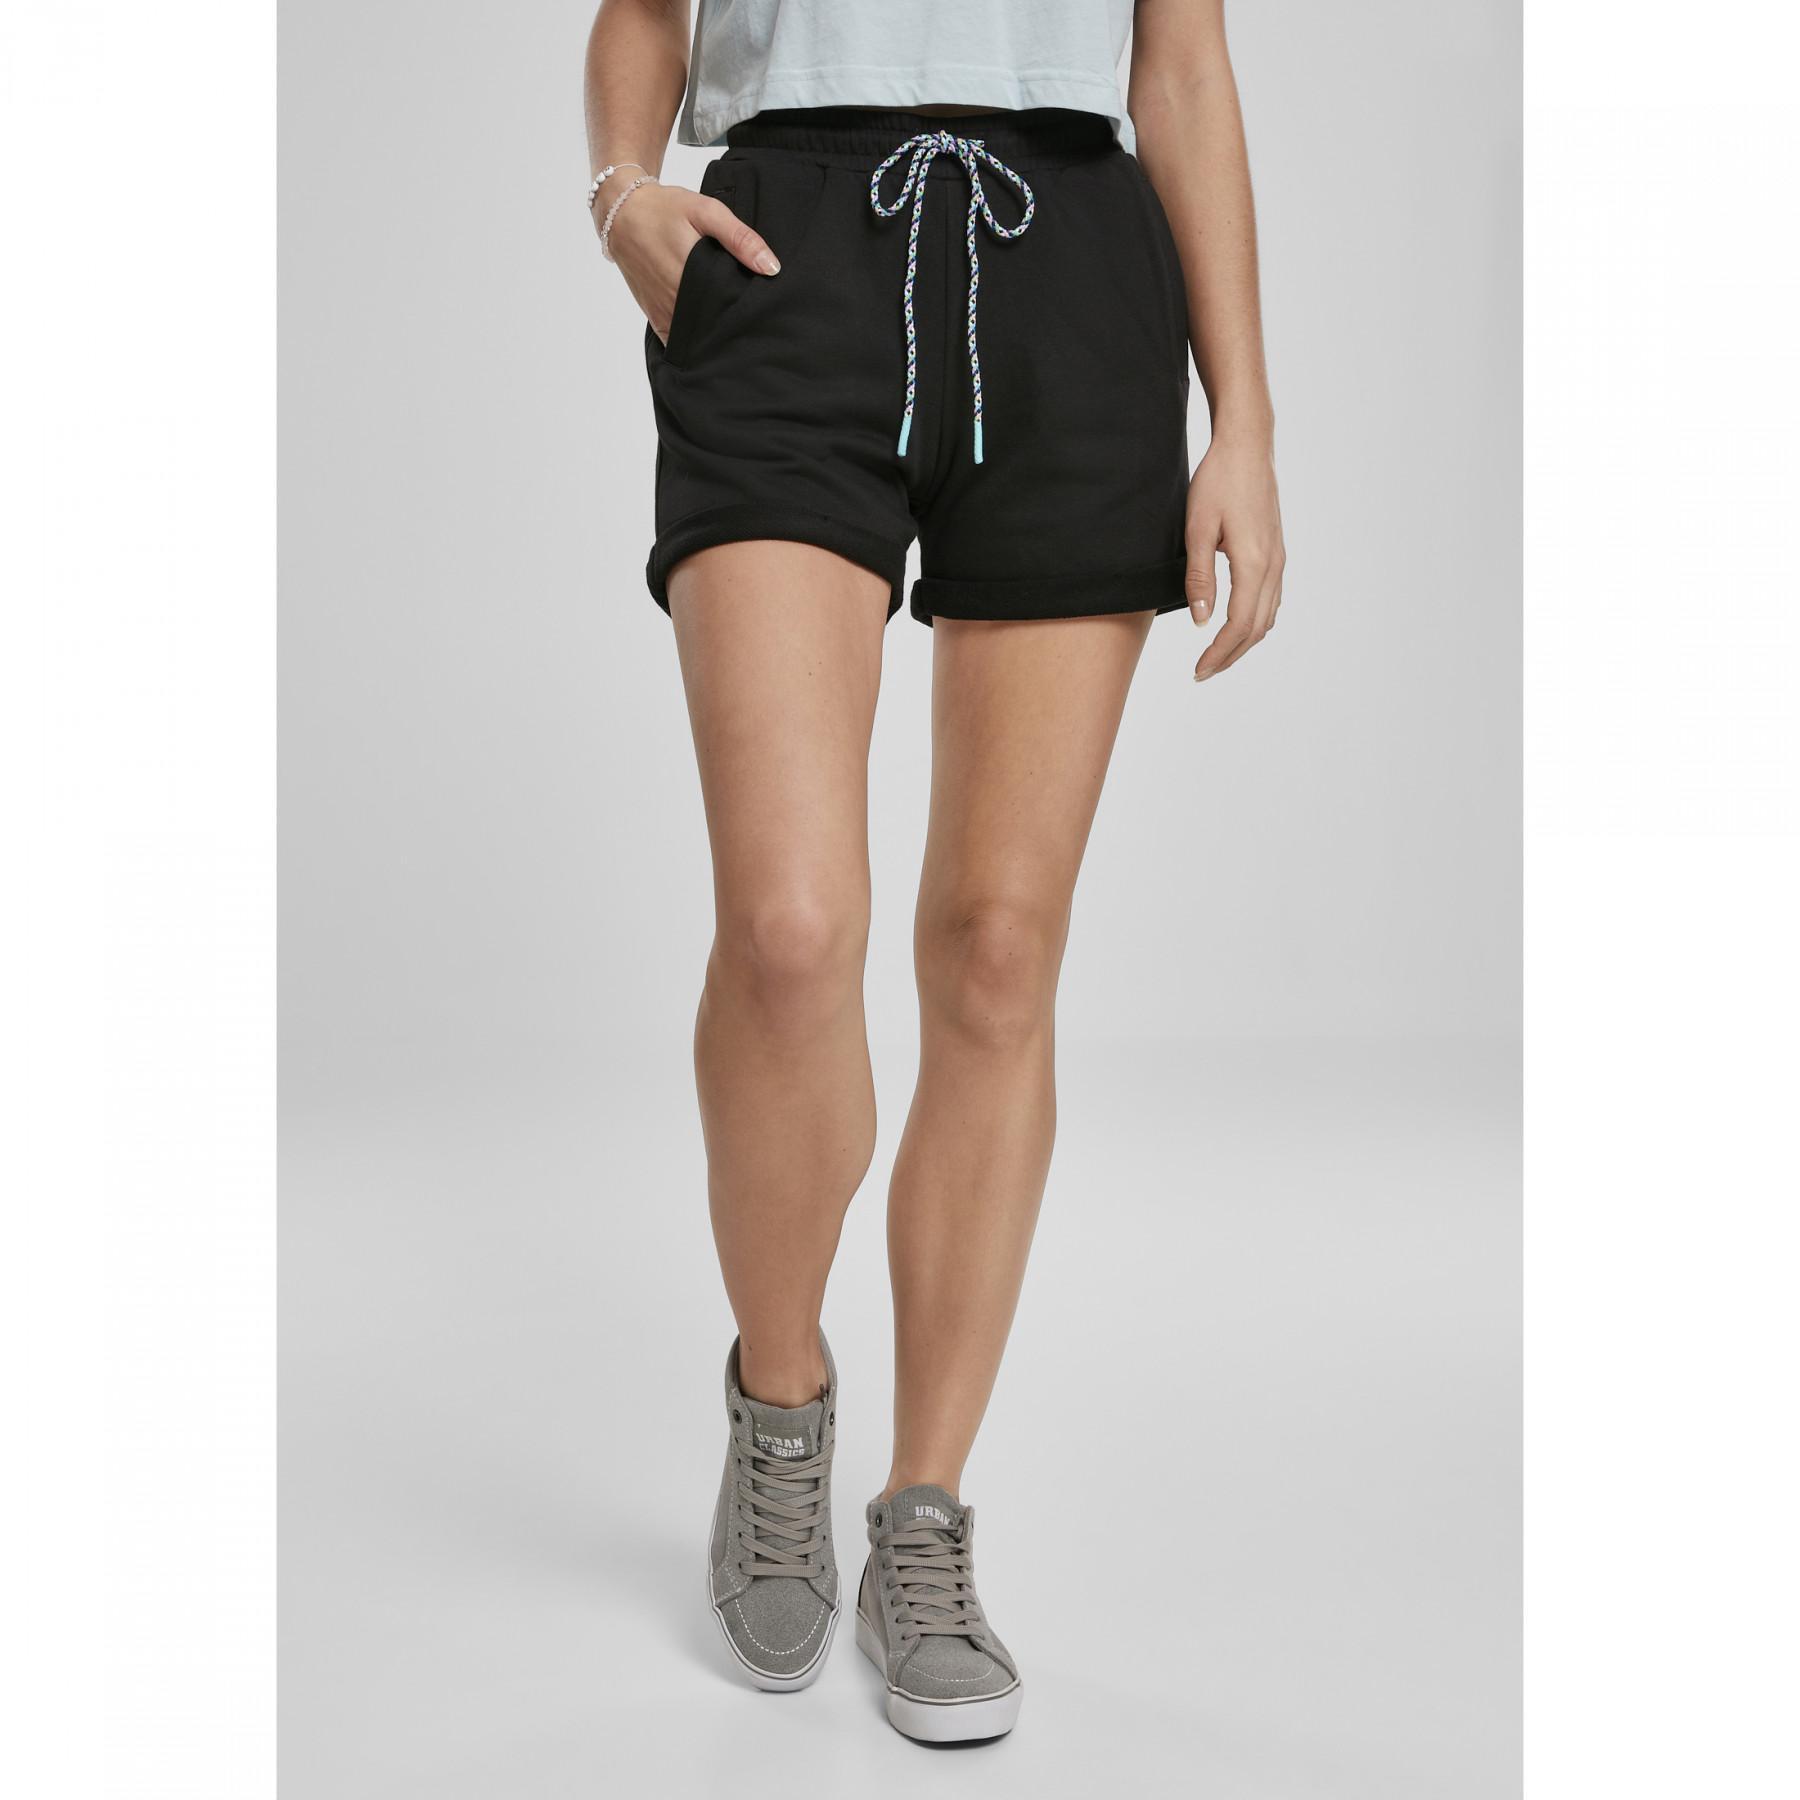 Women's Urban Classic beach terry shorts